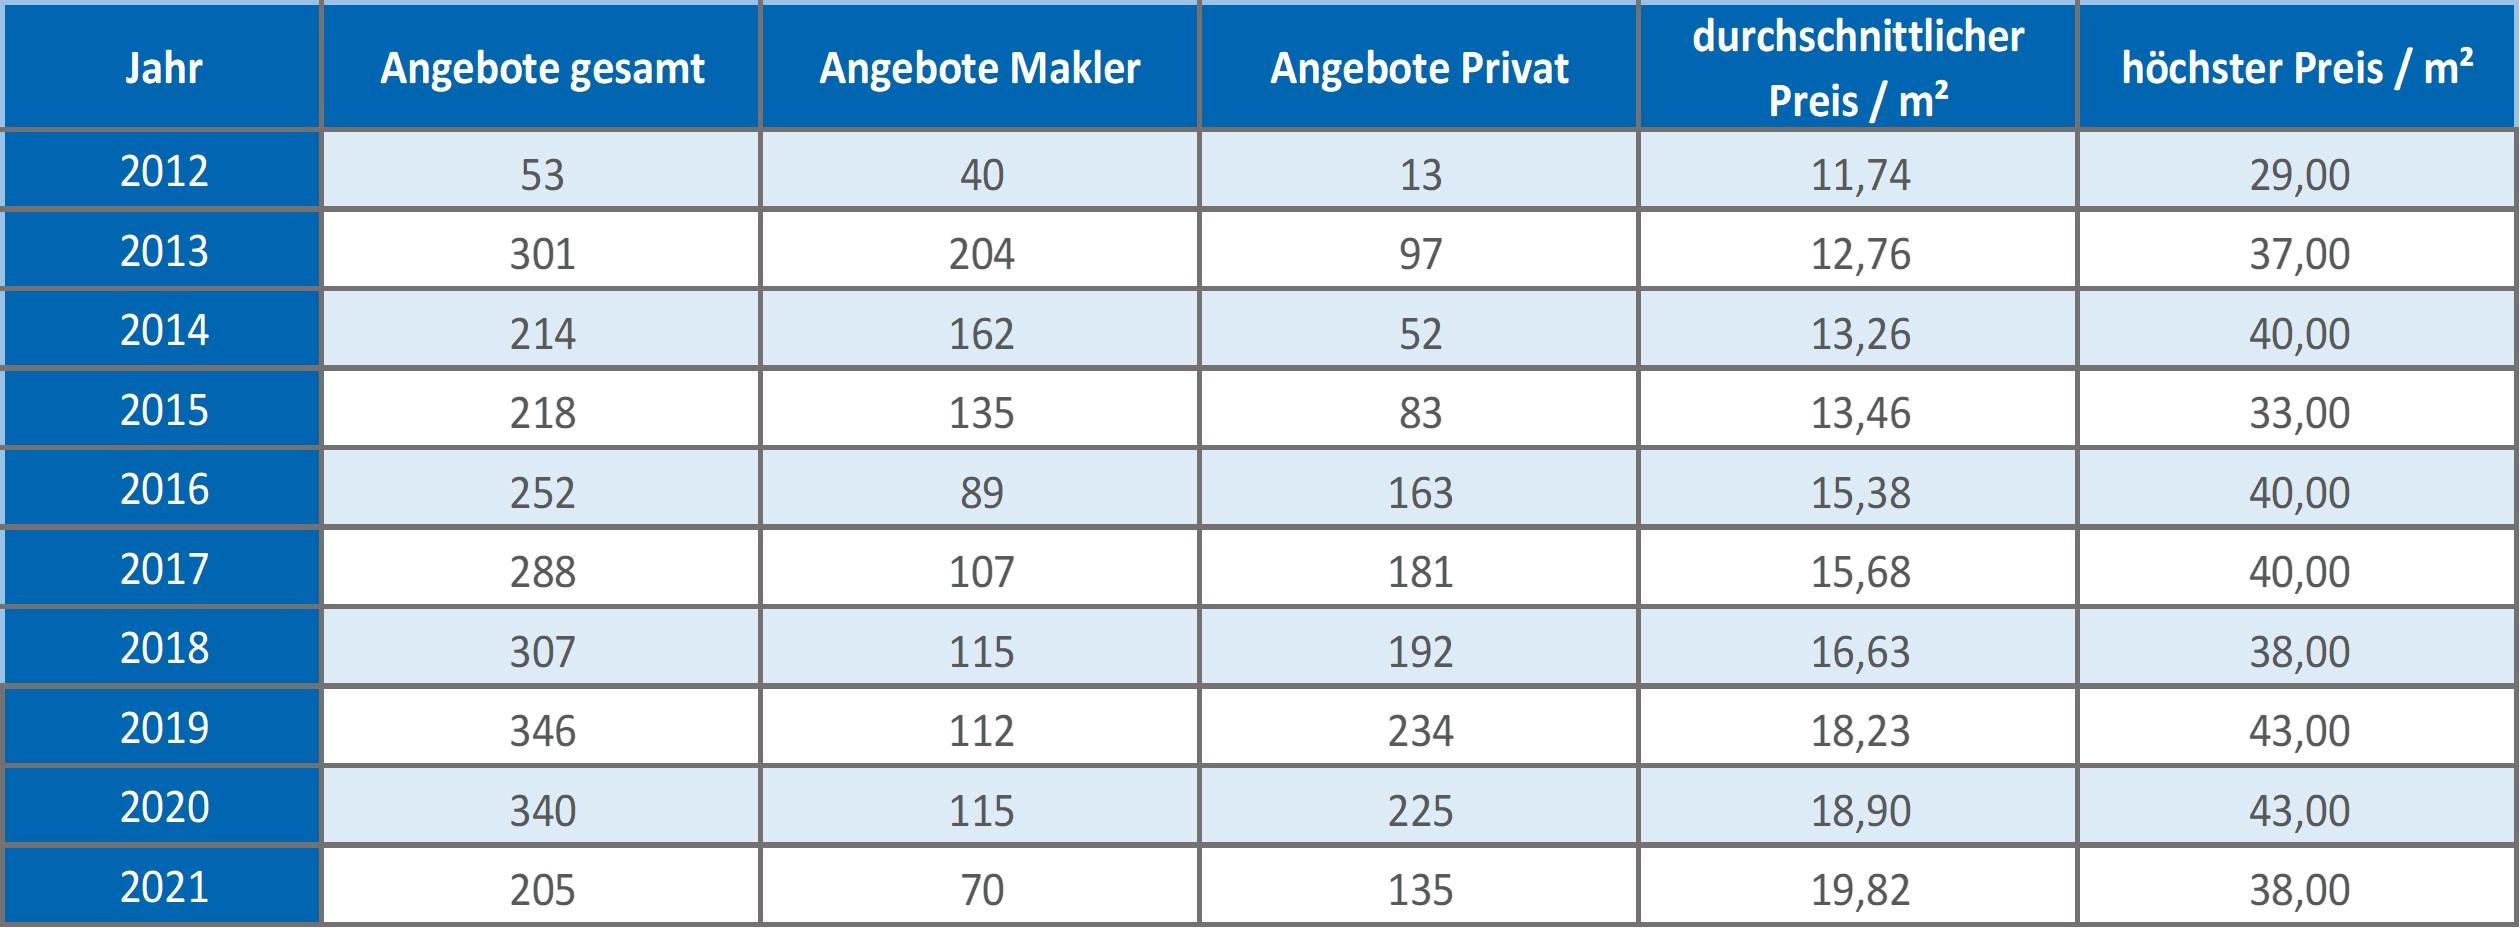 Garching Wohung mieten vermieten Preis Bewertung Makler www.happy-immo.de 2019 2020 2021